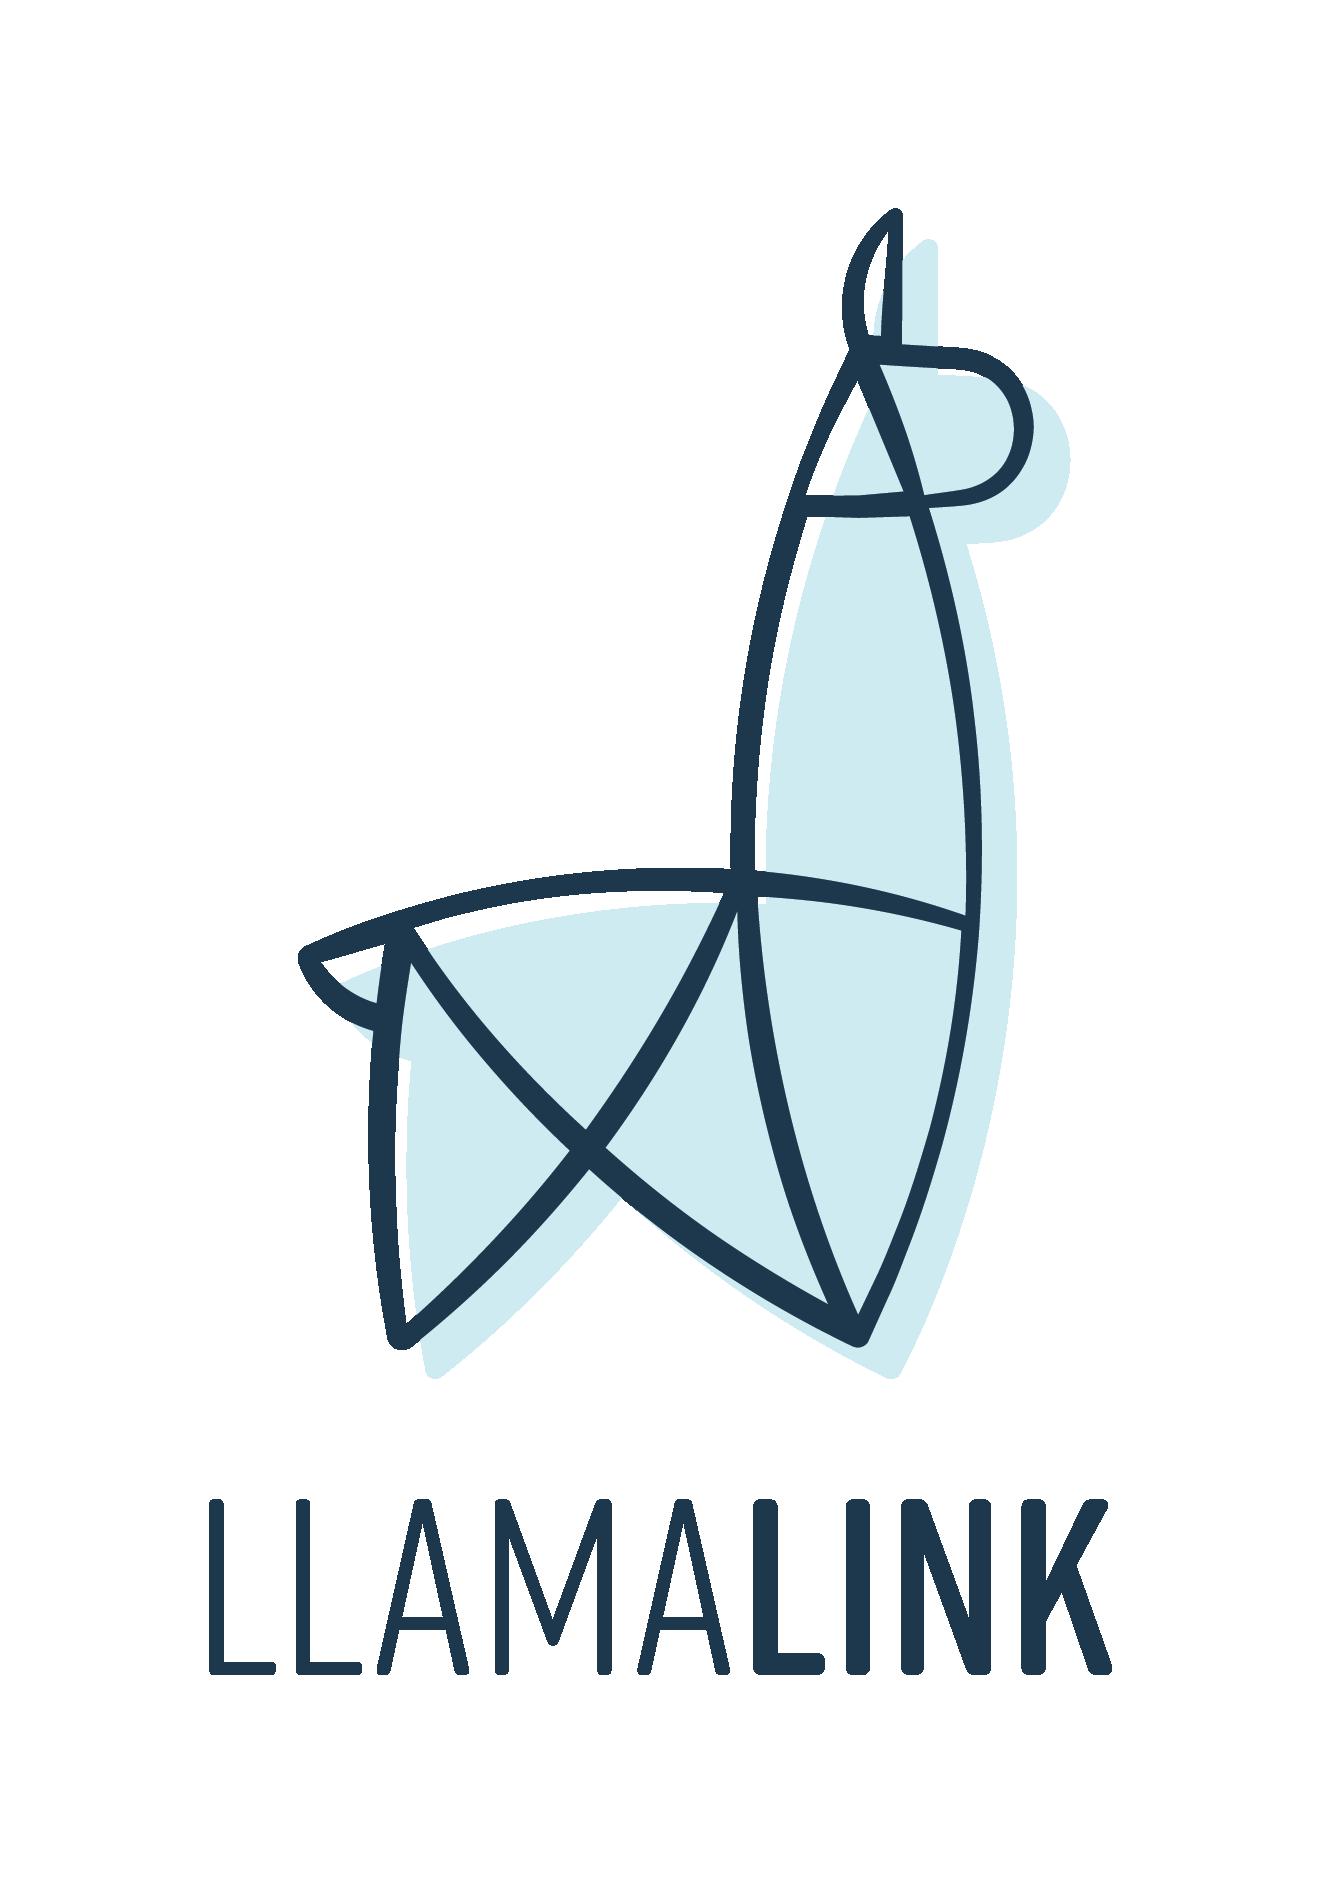 LlamaLink